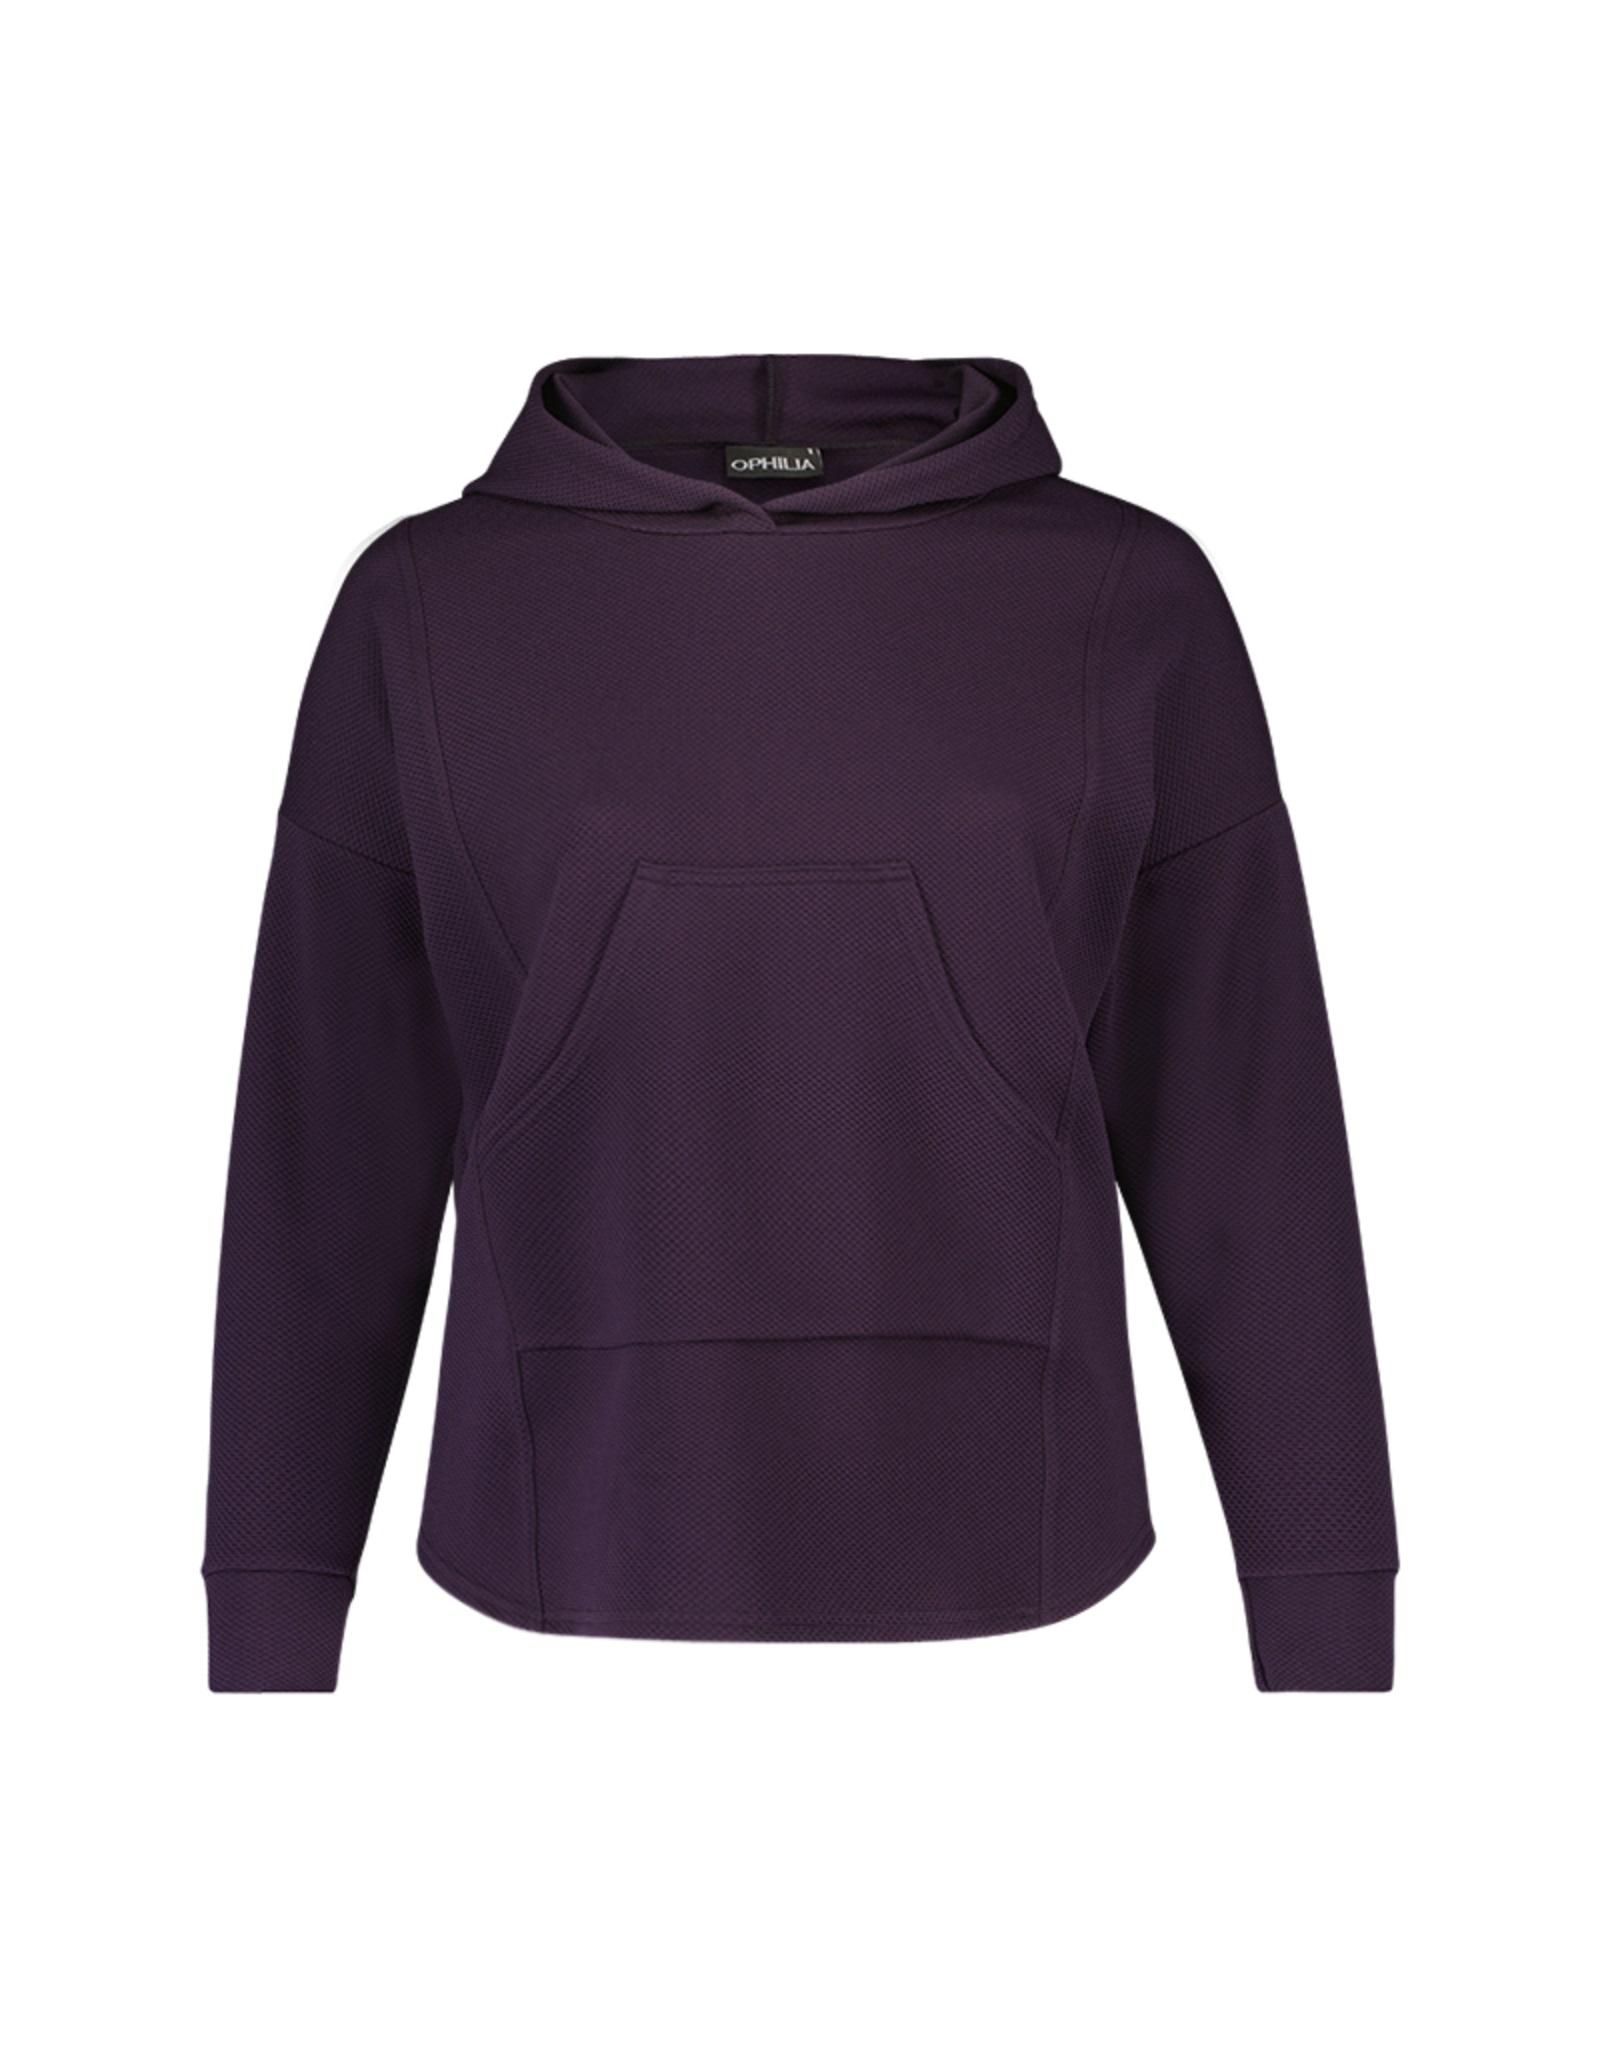 Ophilia shirt Jin sport pique